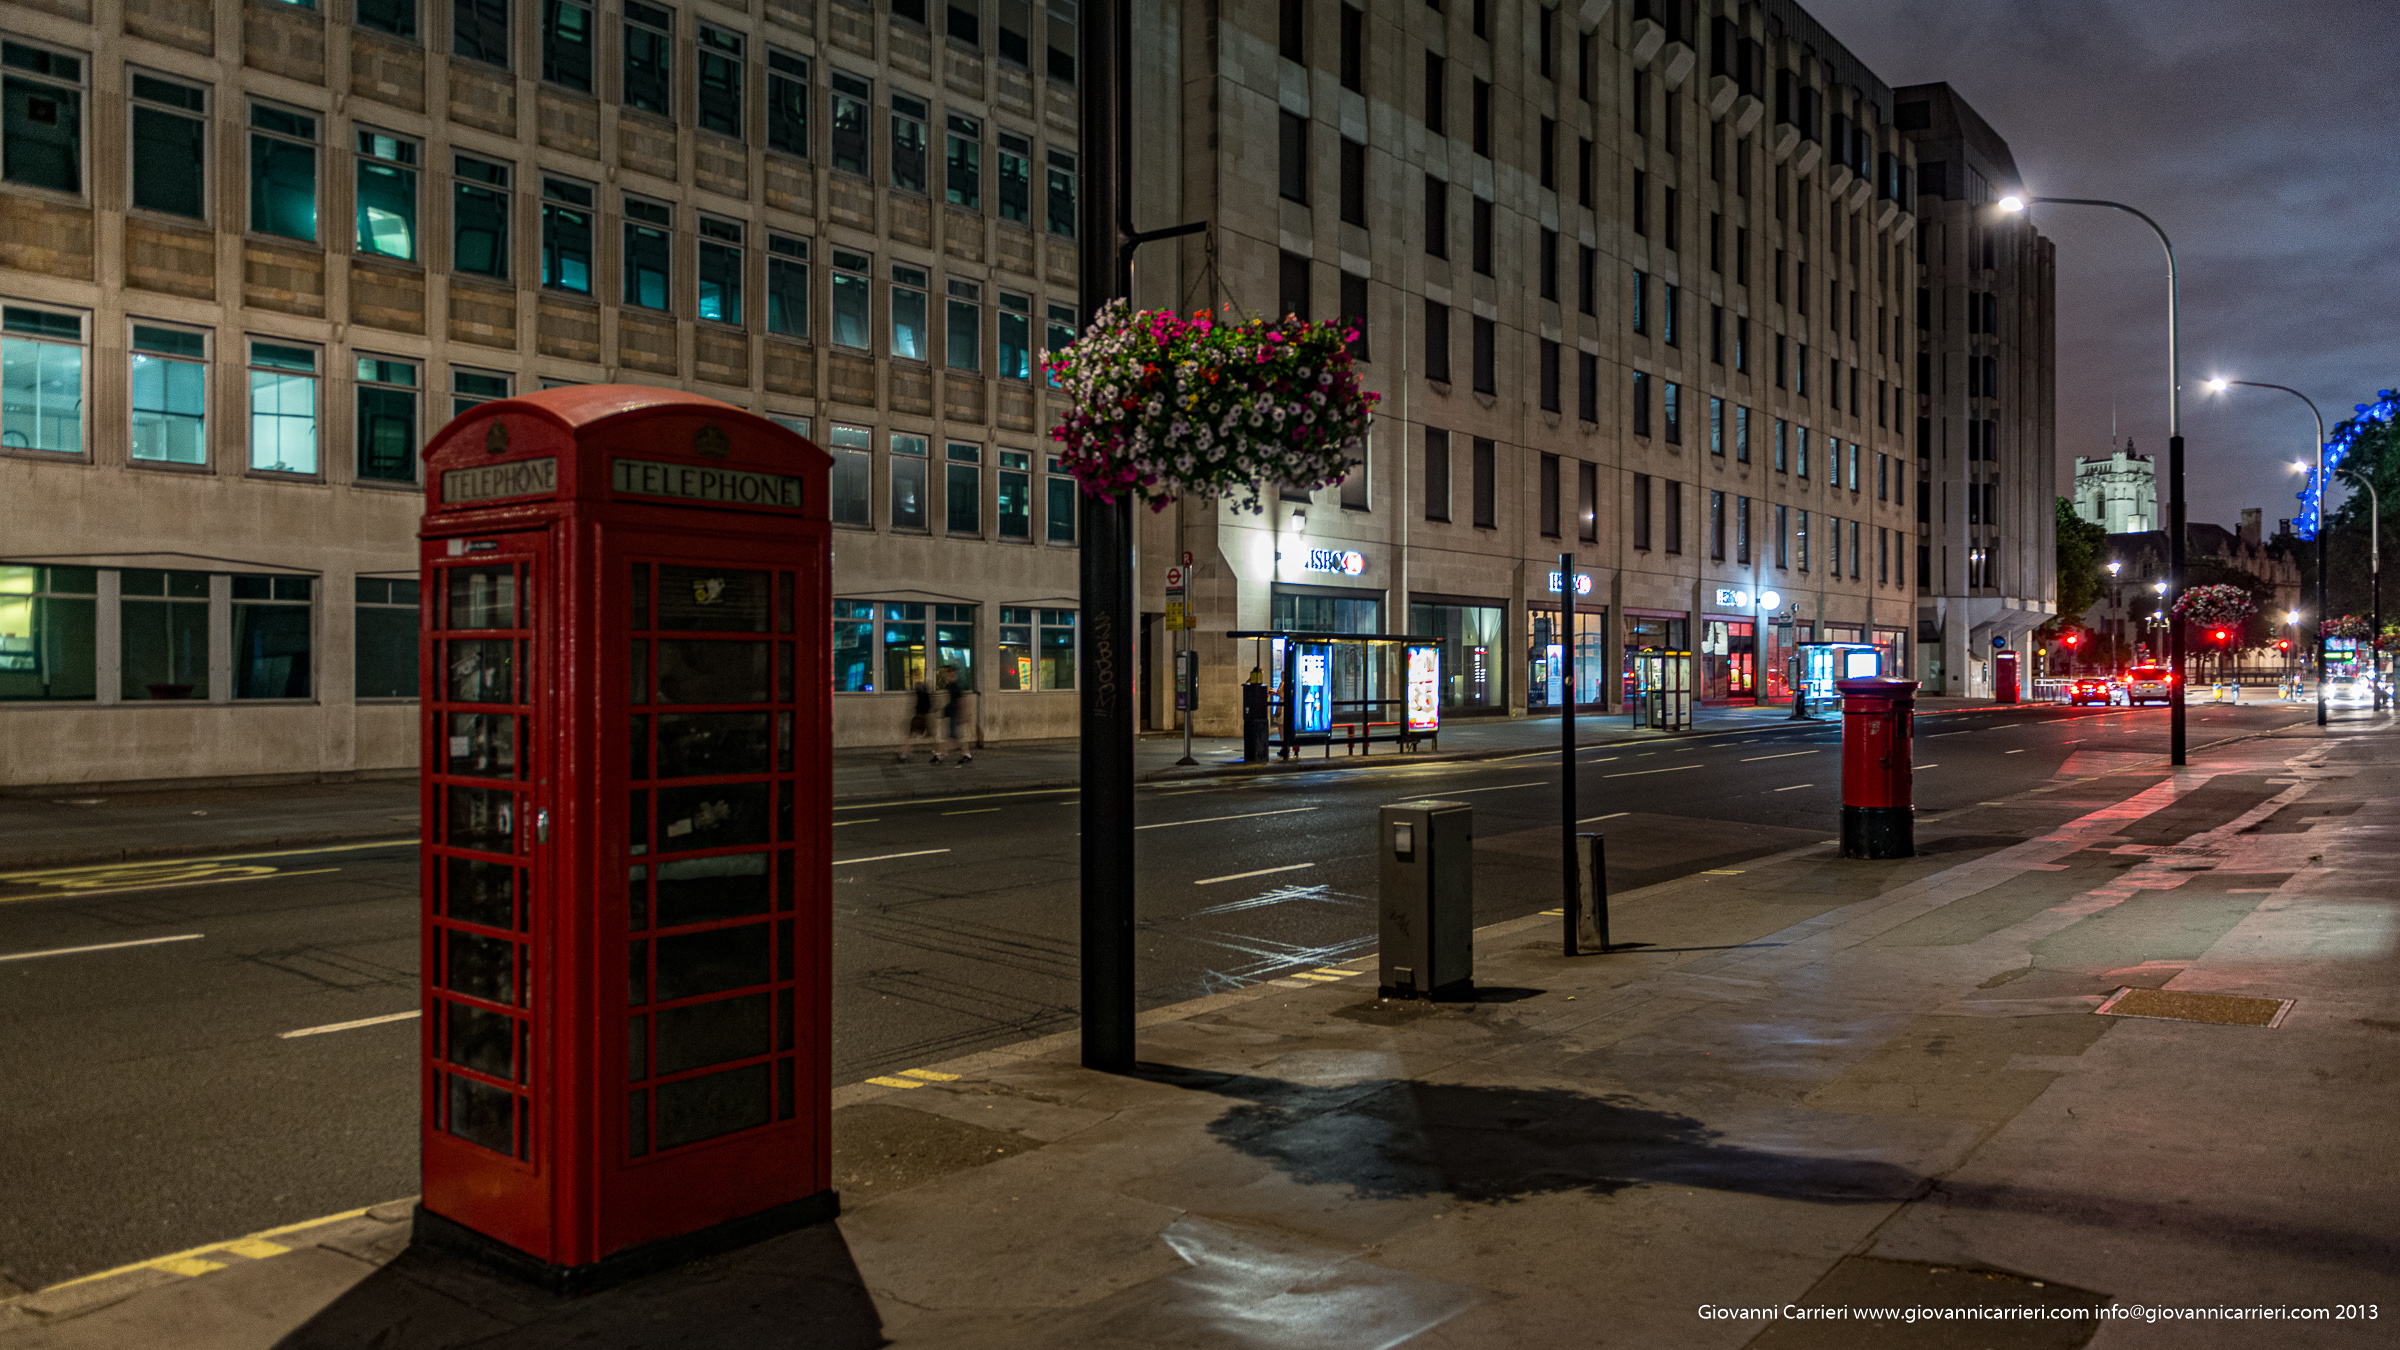 La cabina telefonica